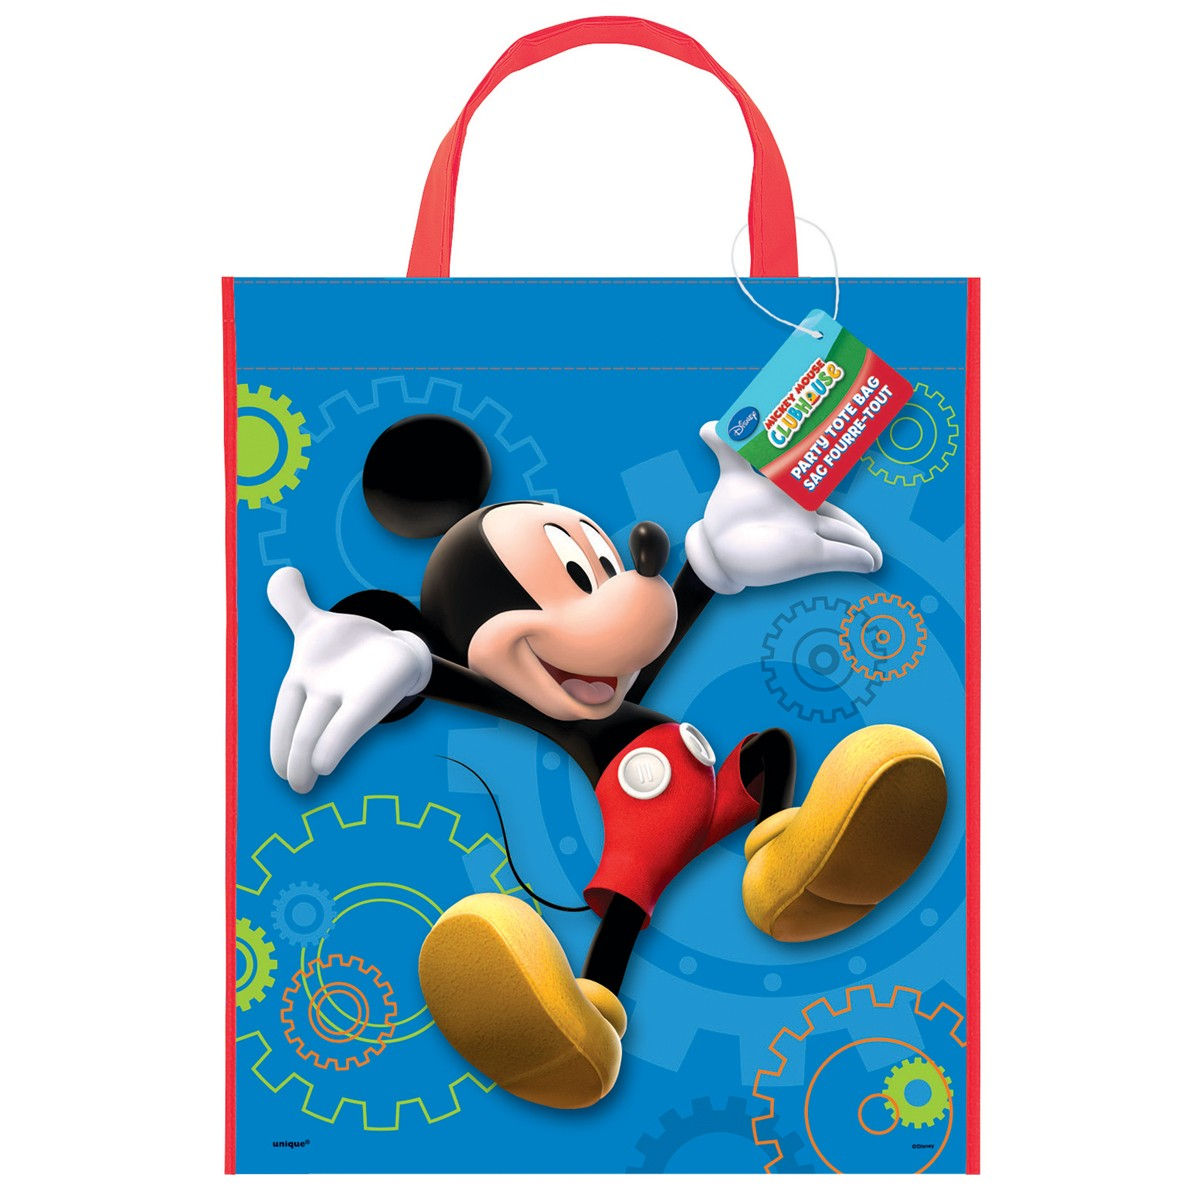 28e39de383 Disney Mickey Mouse Reusable Tote Bag (1). Zoom. Move your mouse over image